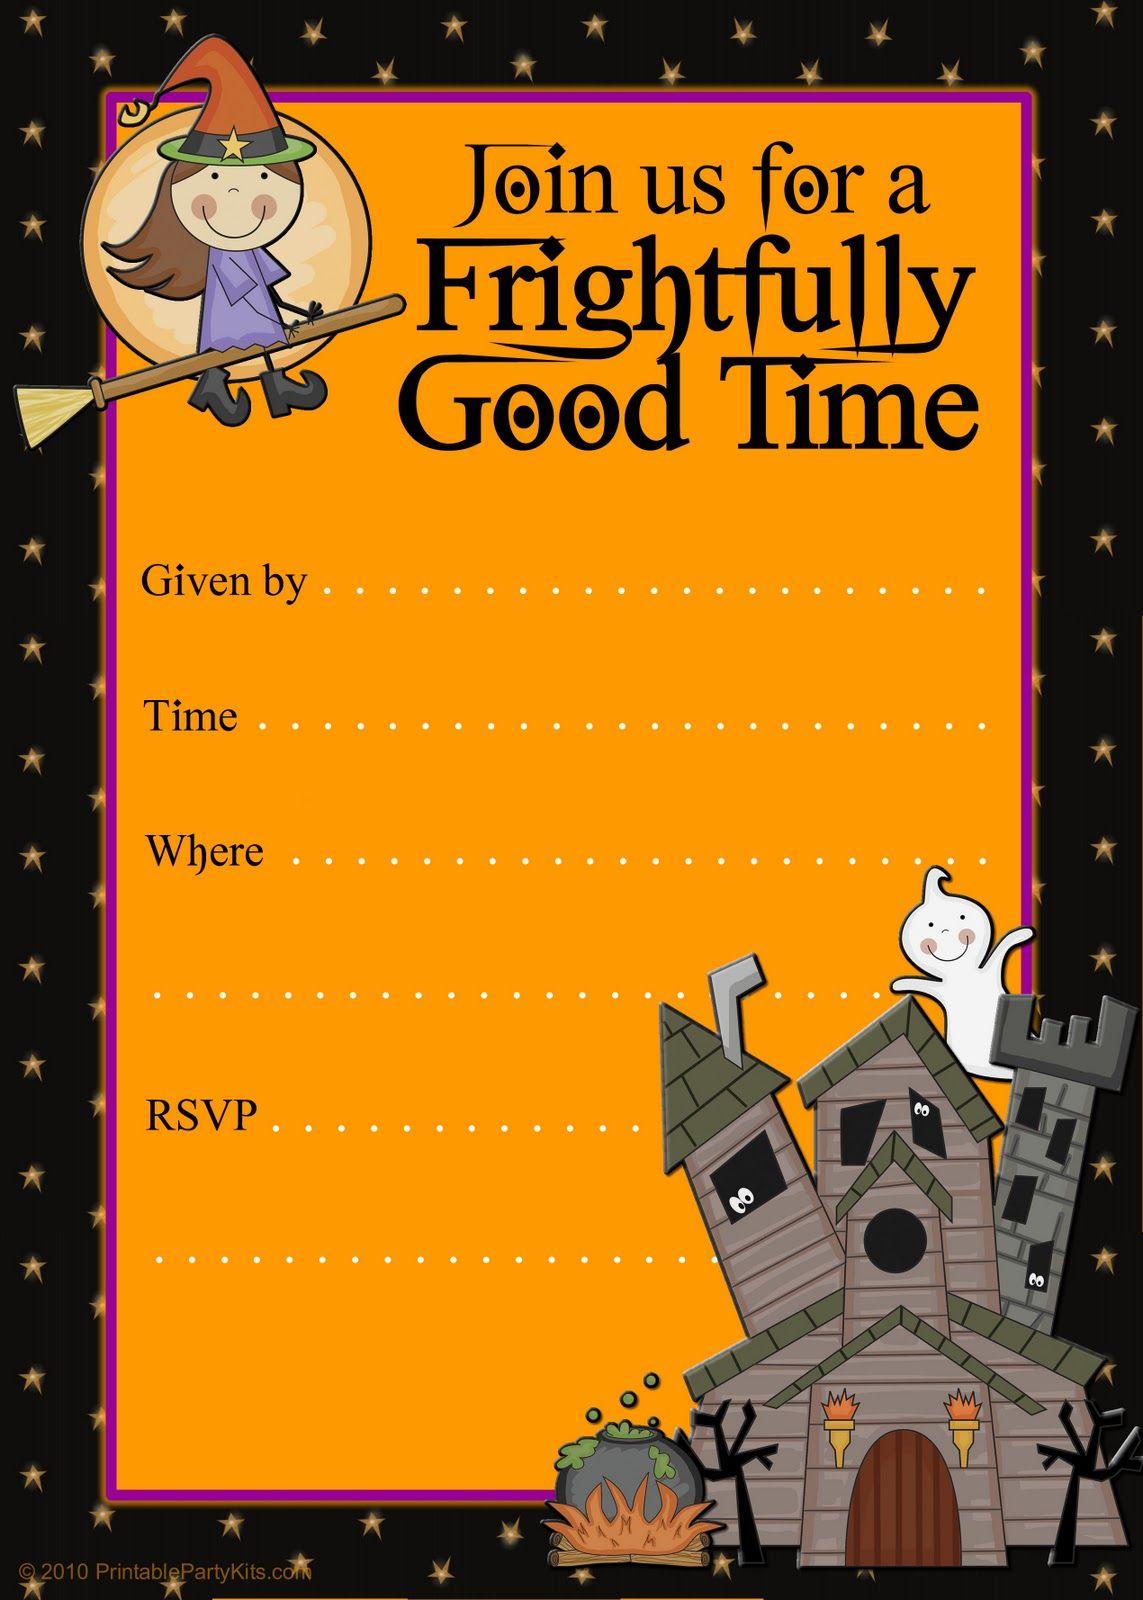 Free Halloween Flyer Invitations Printable Kids Halloween Party Invitations Halloween Party Invitations Printable Halloween Party Invitations